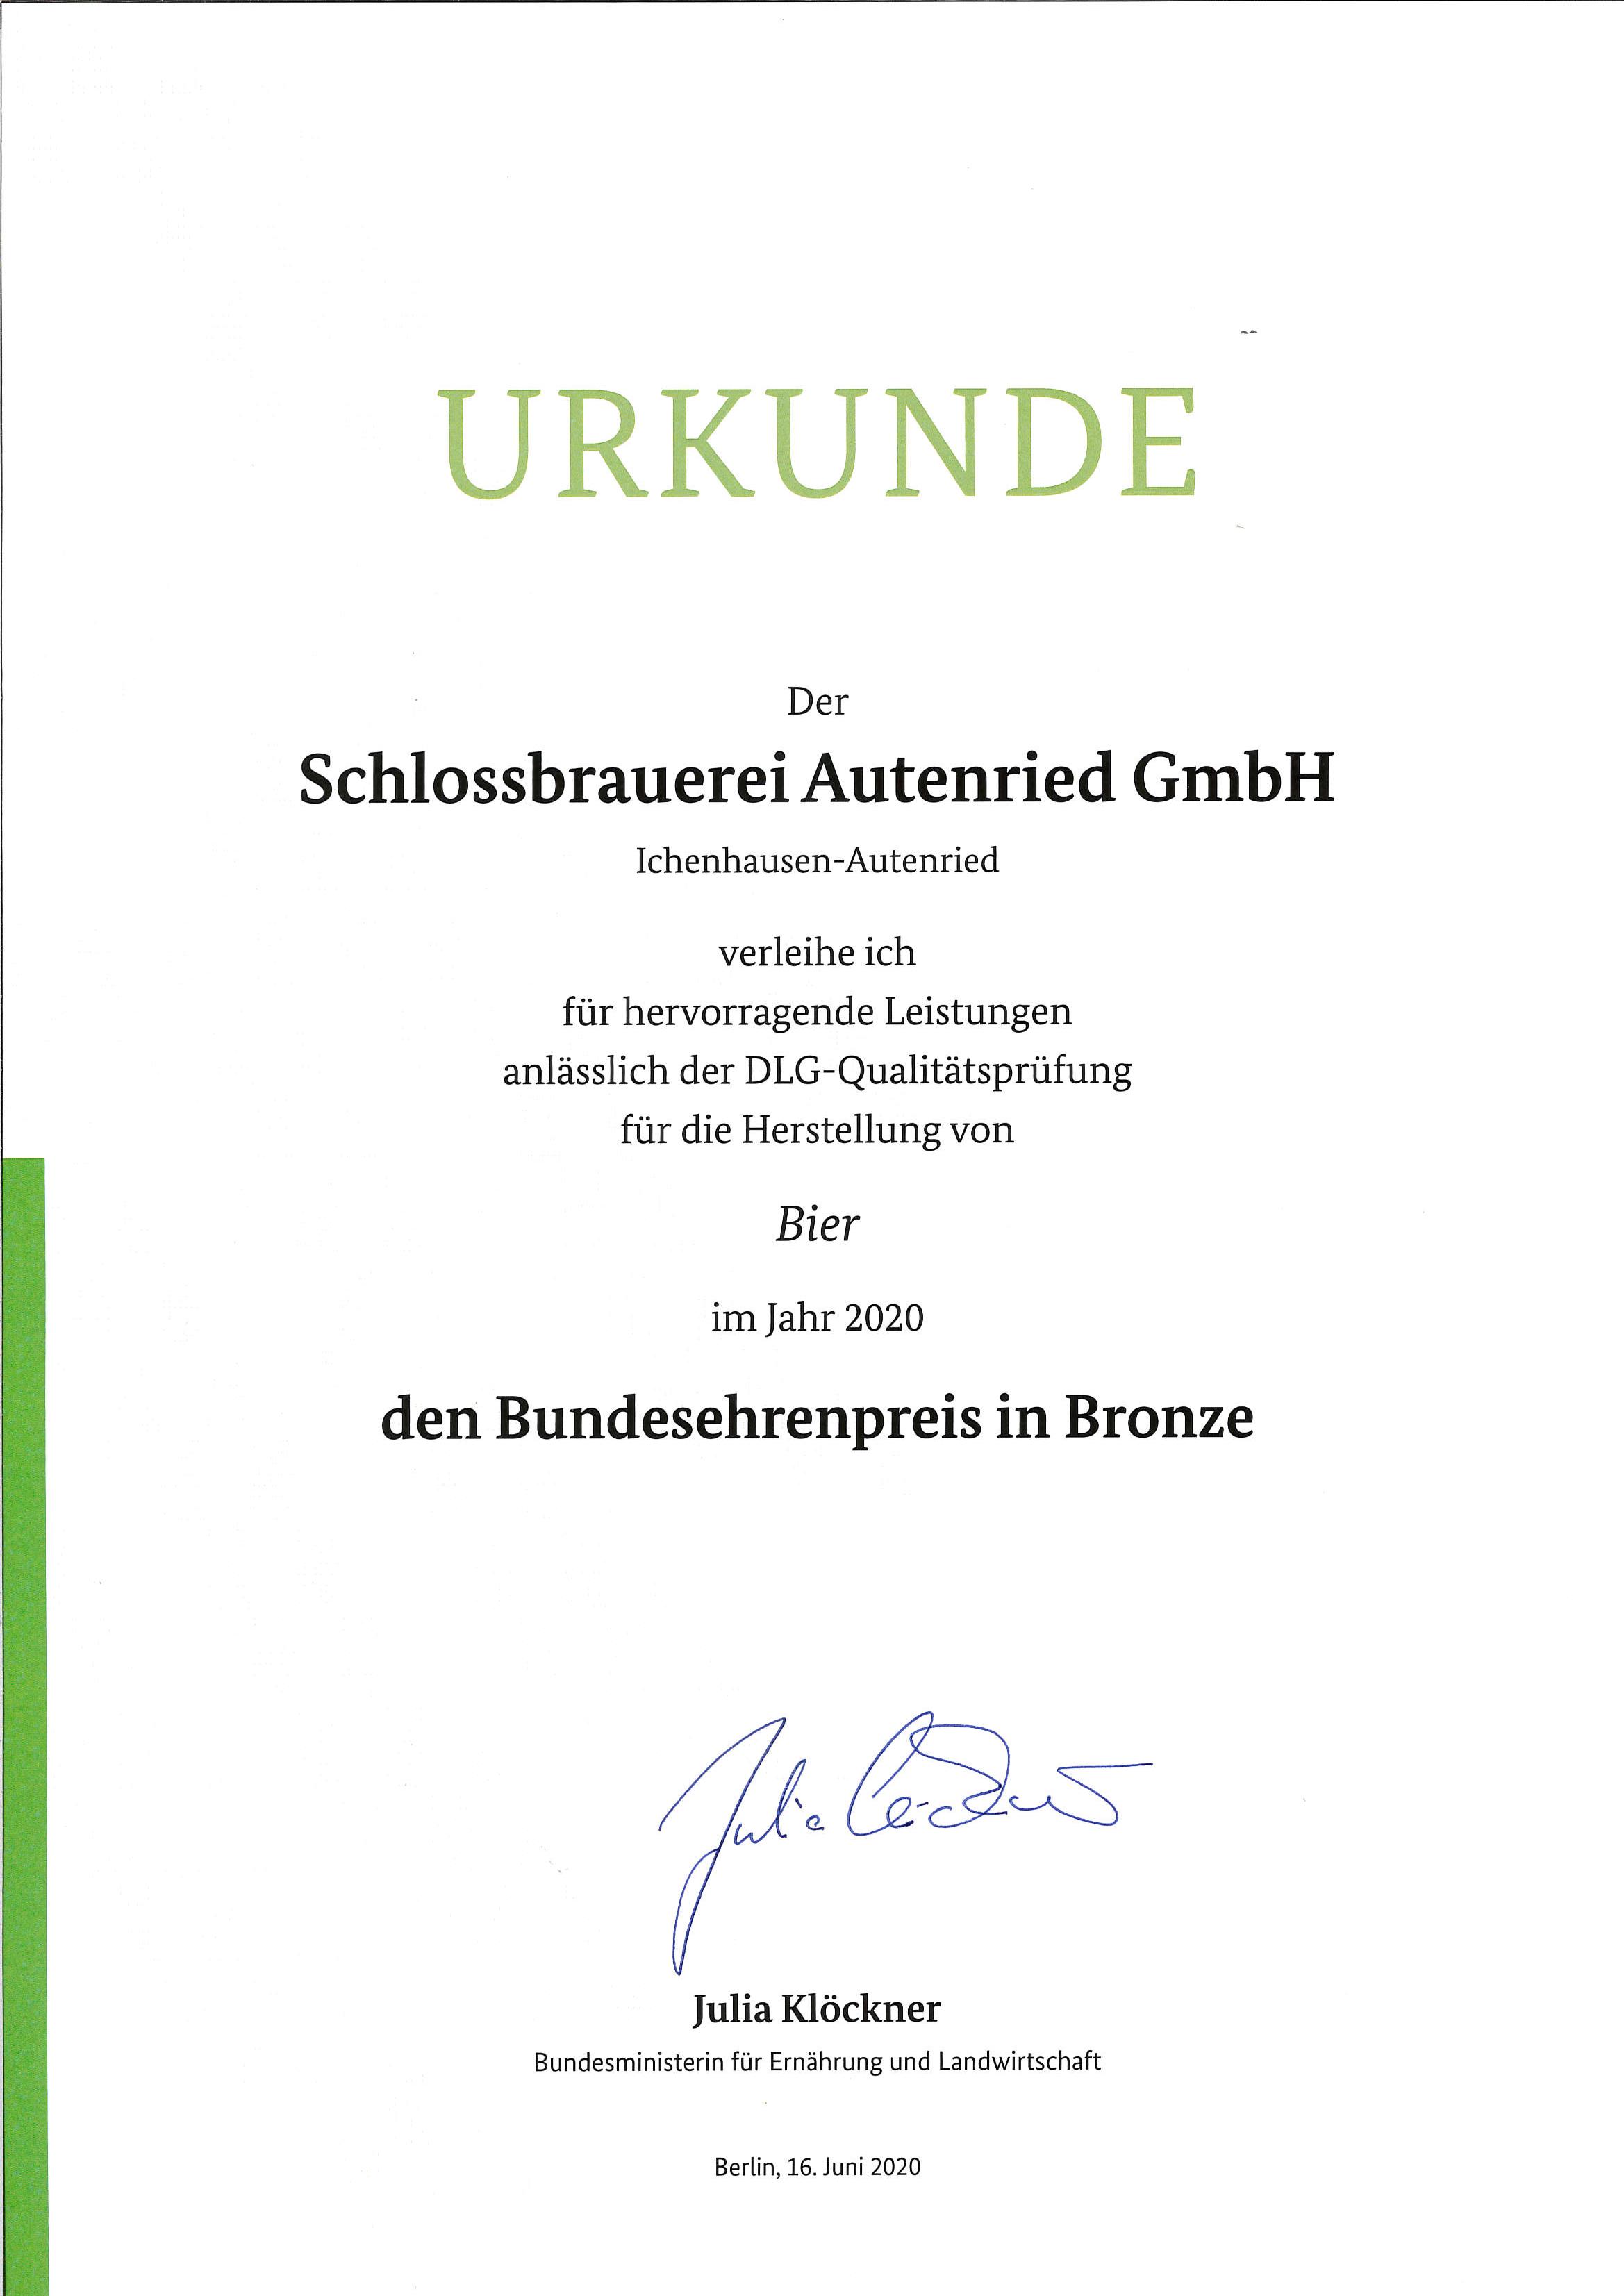 Urkunde Bundesehrenpreis 2020